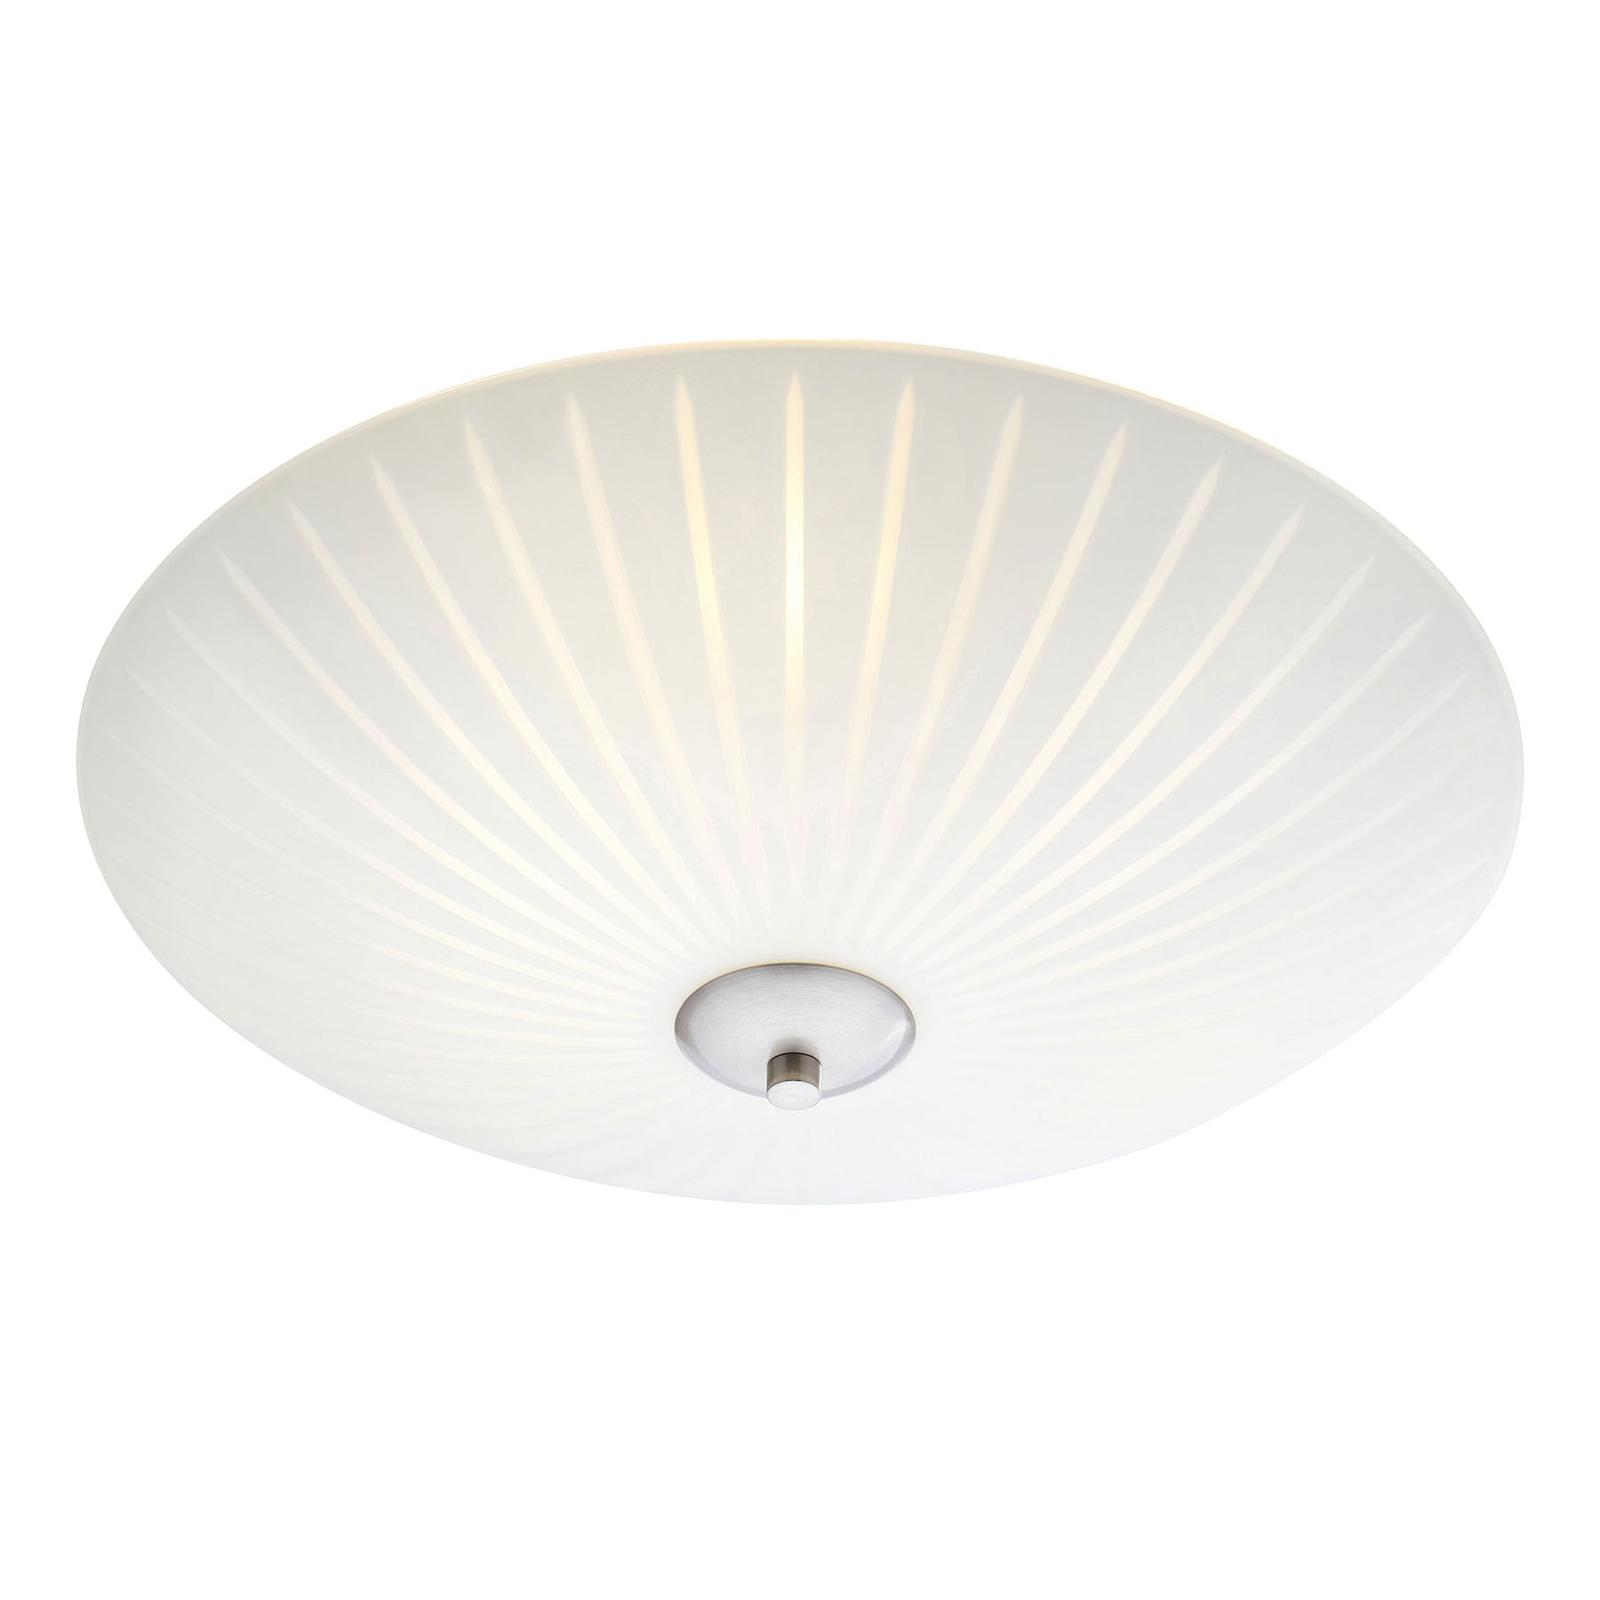 Glass-taklampe Cut, Ø 43 cm